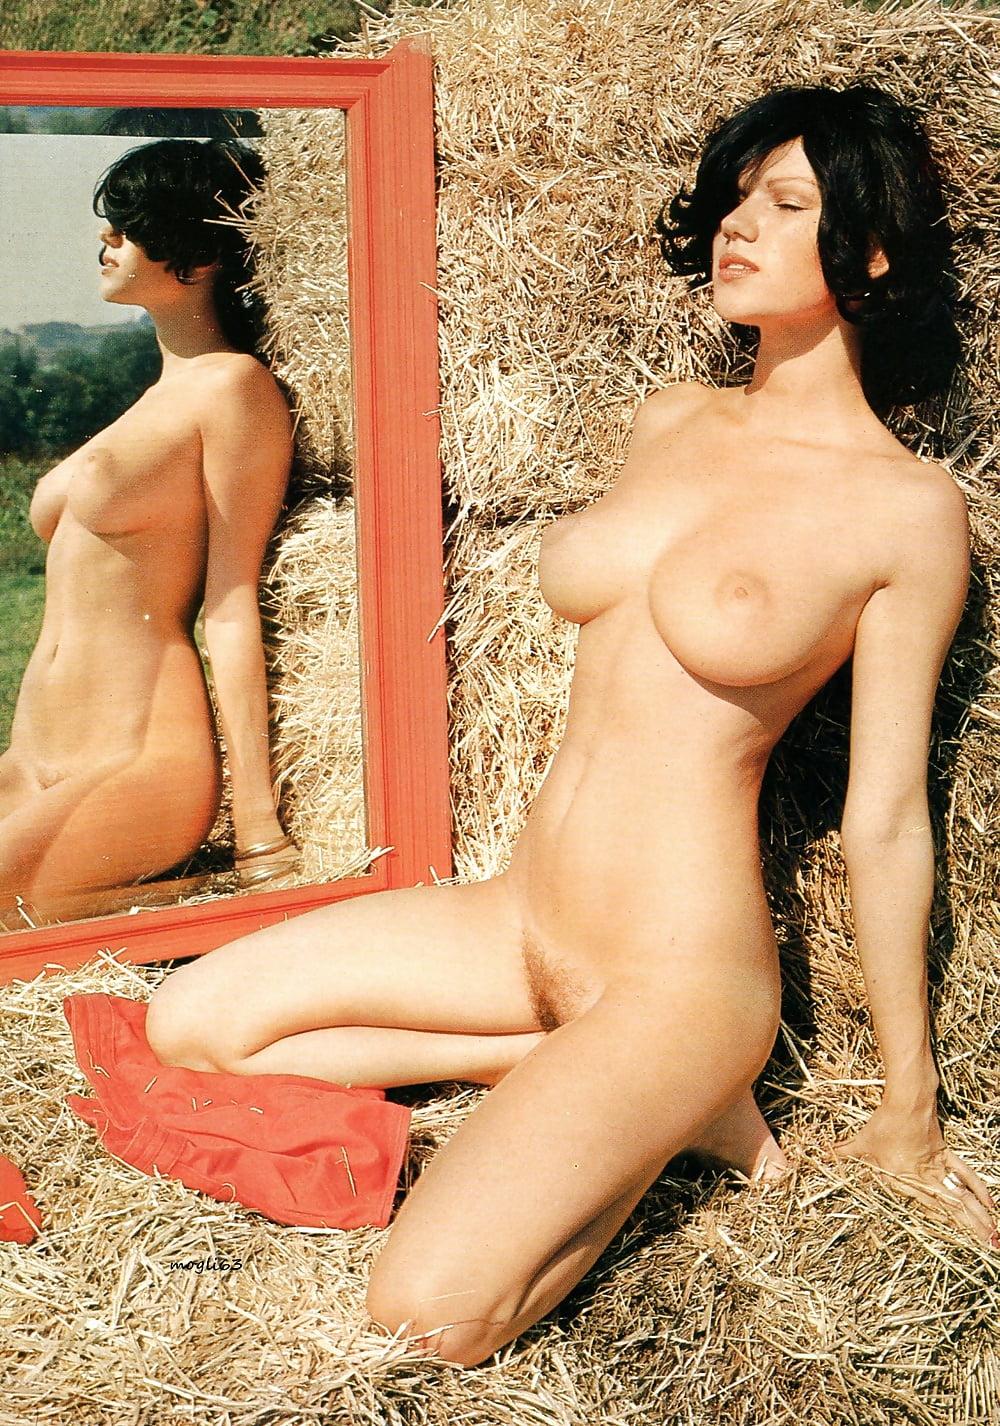 Nude brigitte lahaie — photo 2